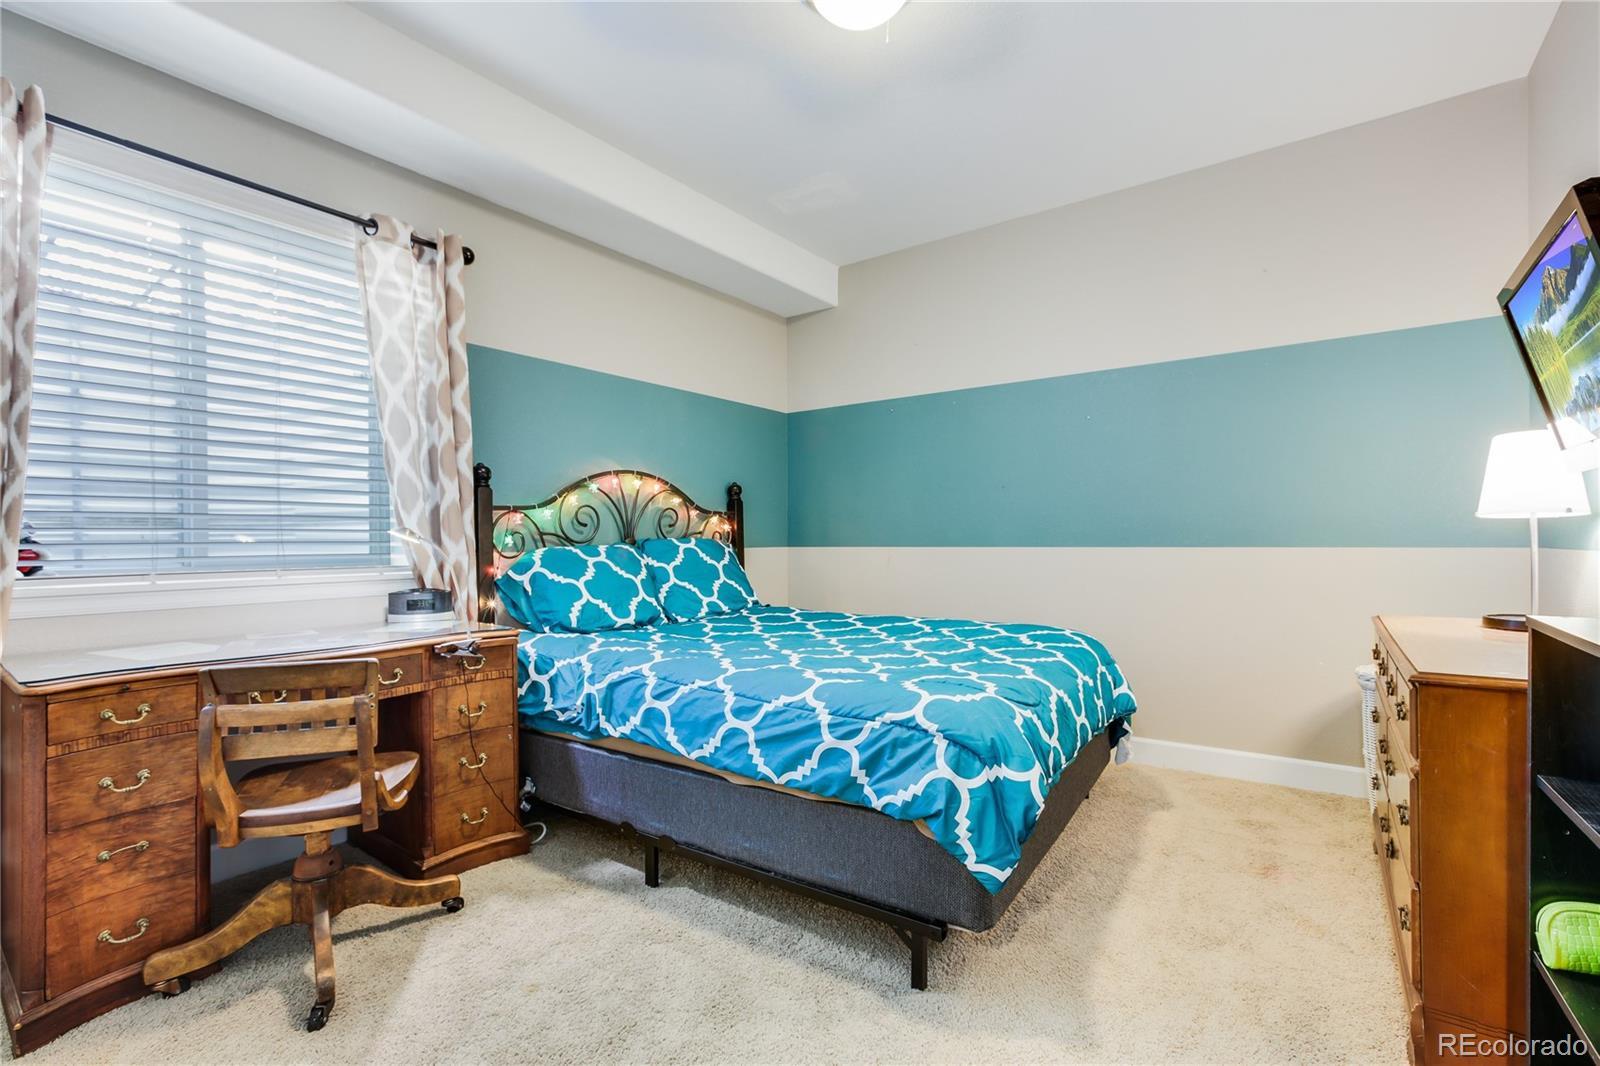 MLS# 8375714 - 31 - 8099 Sabino Lane, Castle Rock, CO 80108